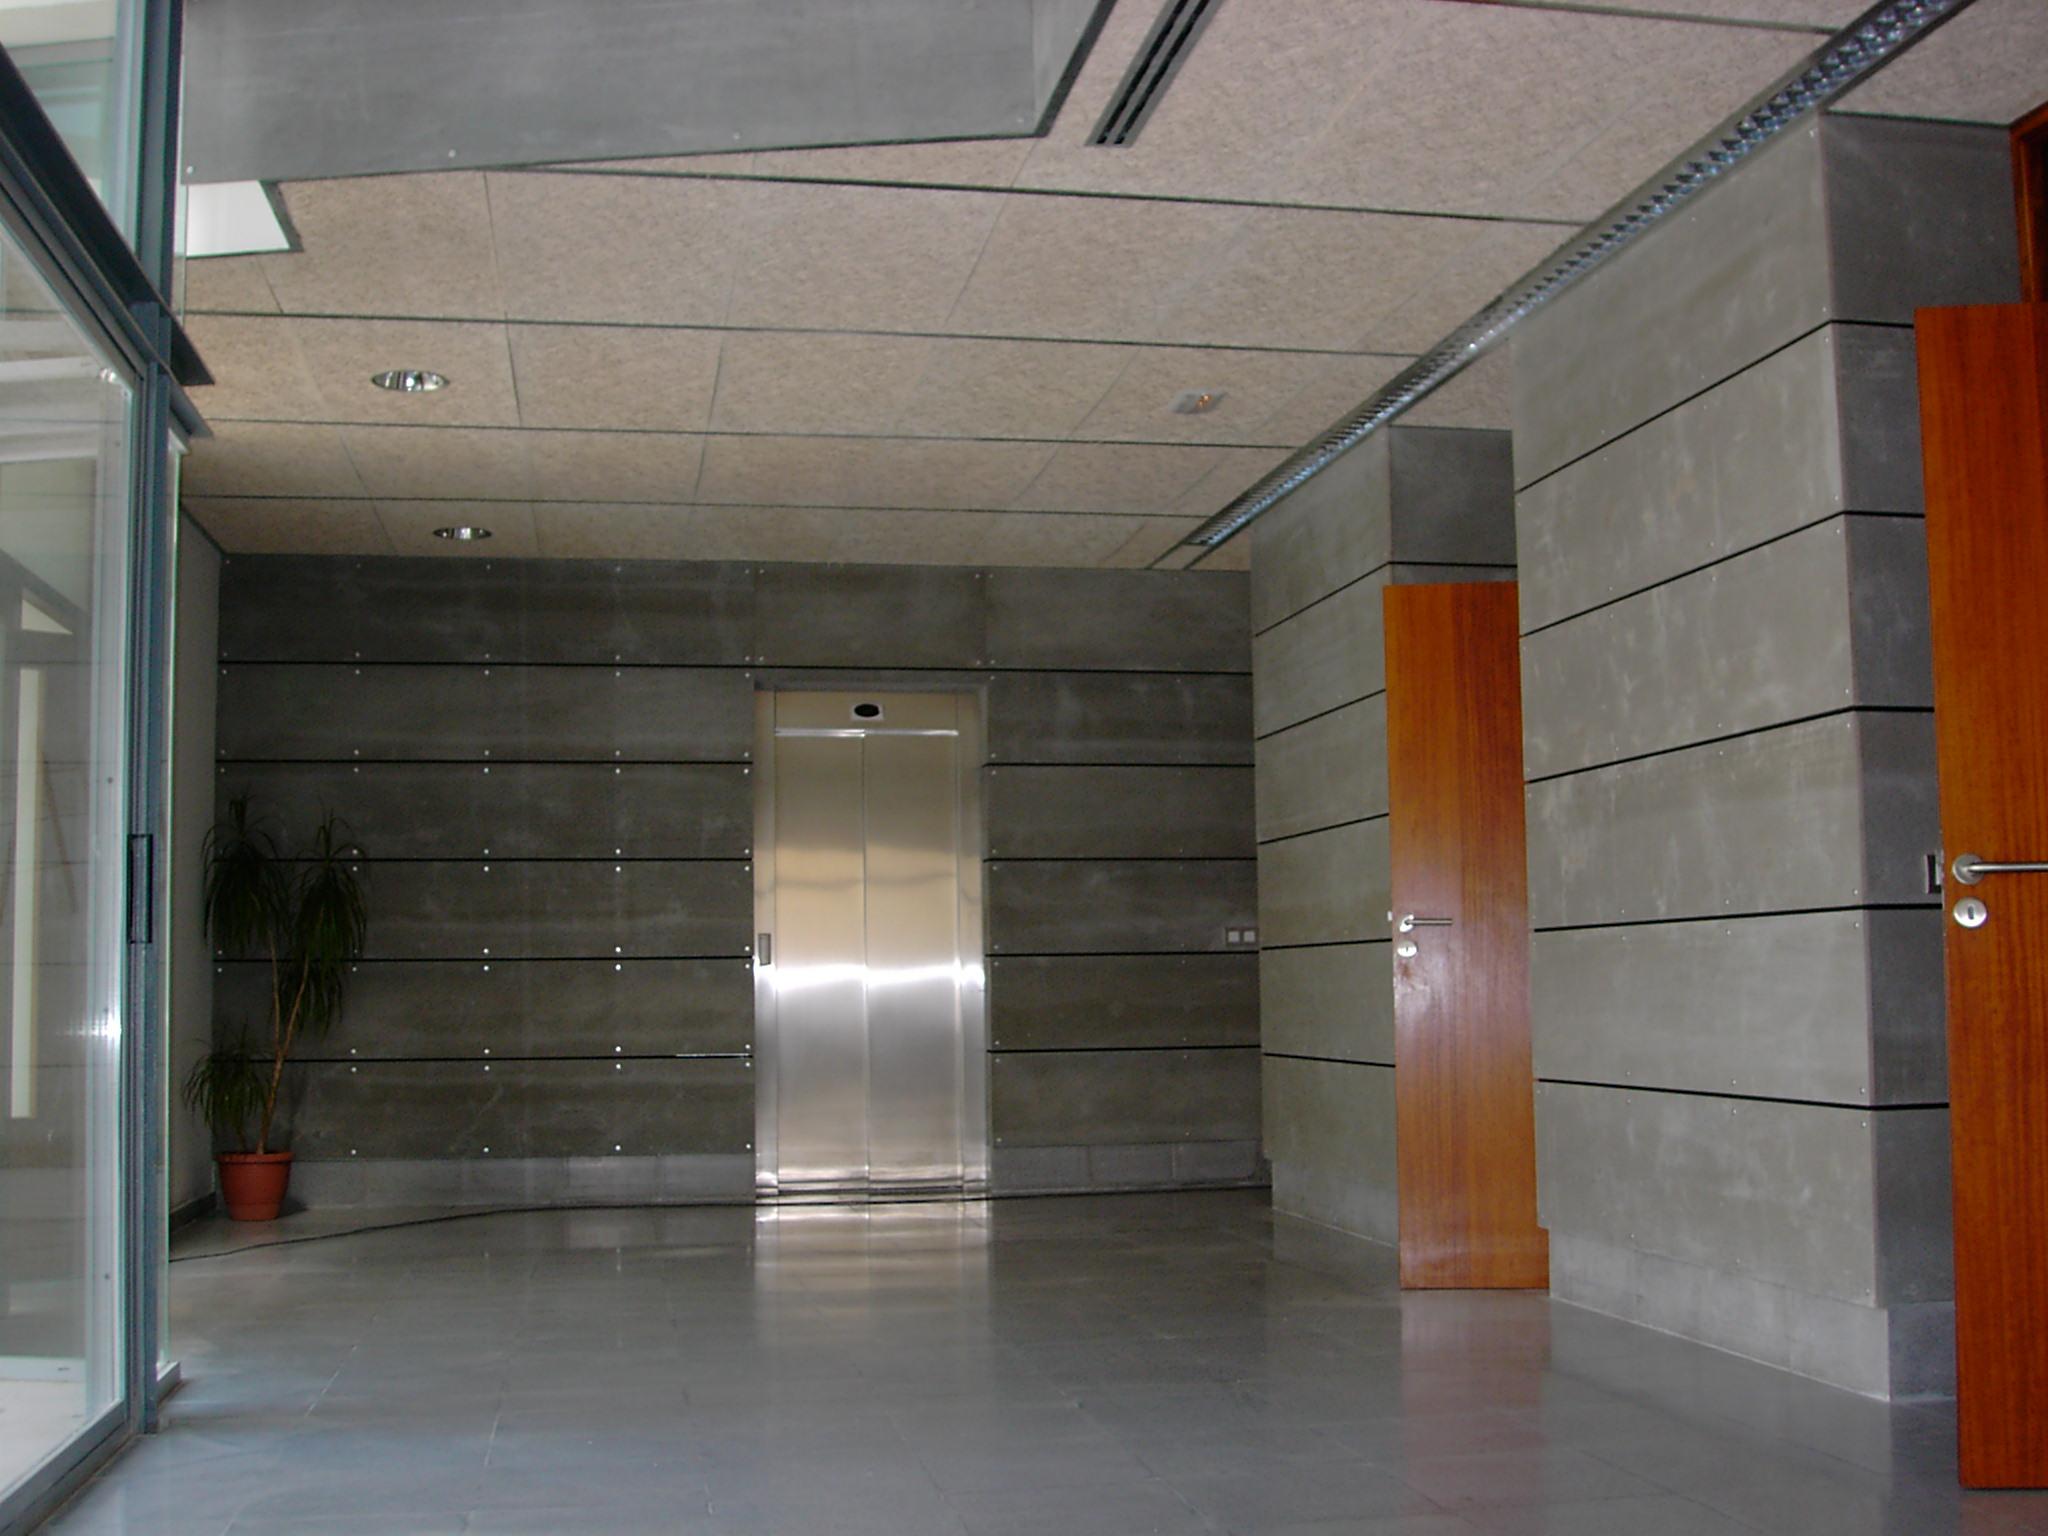 wall 2.jpg